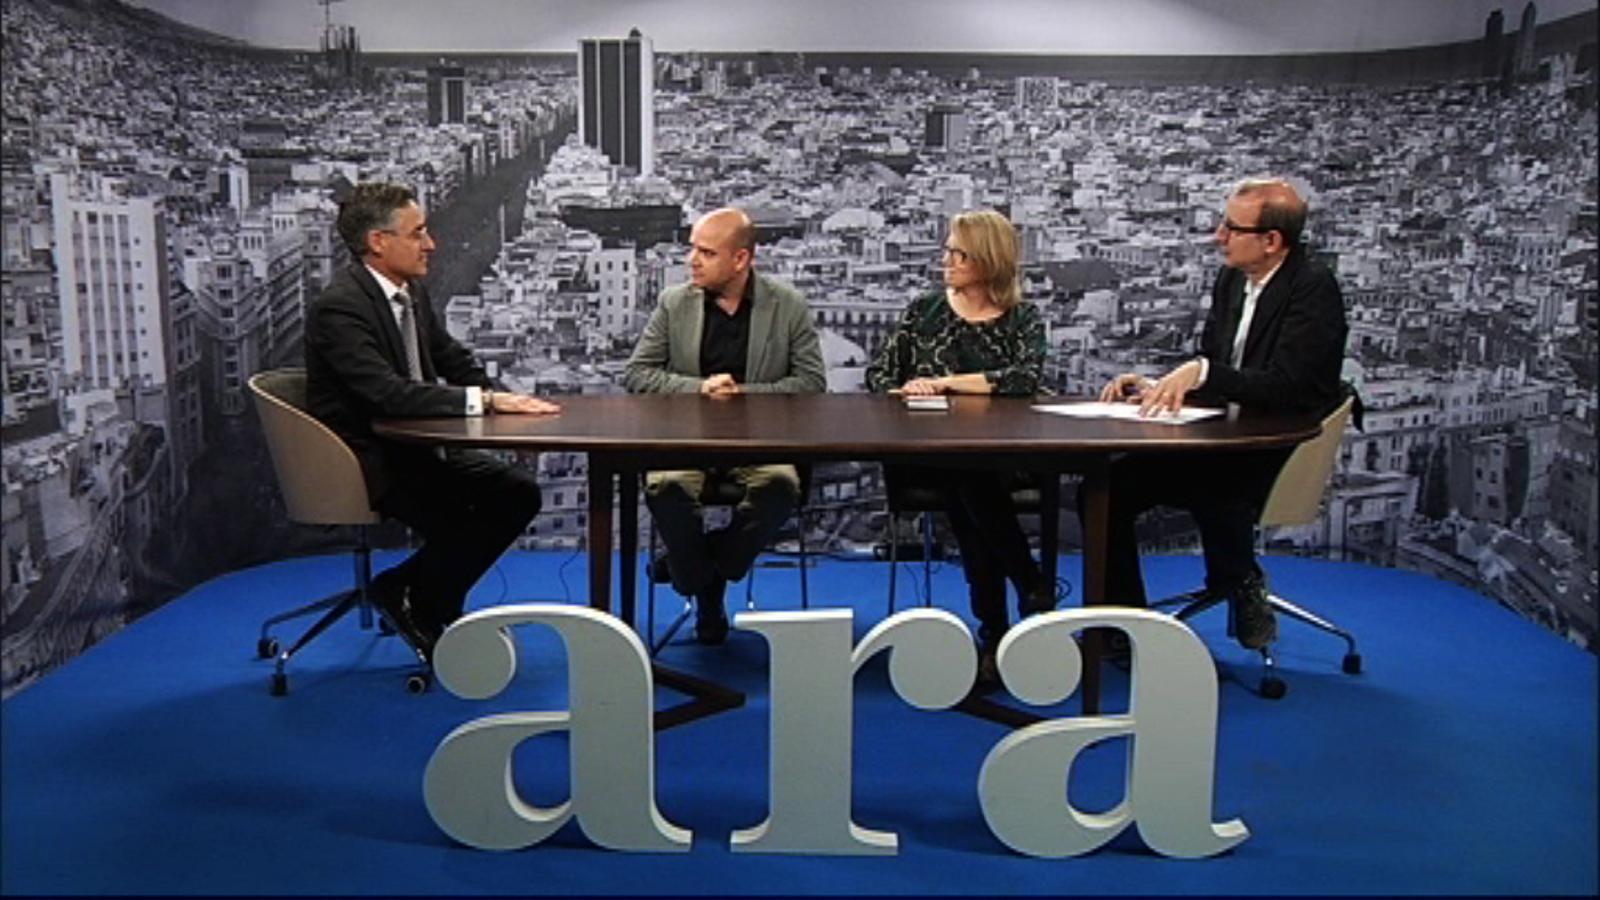 Especial entrevistes Eleccions Europees (1), amb Ramon Tremosa